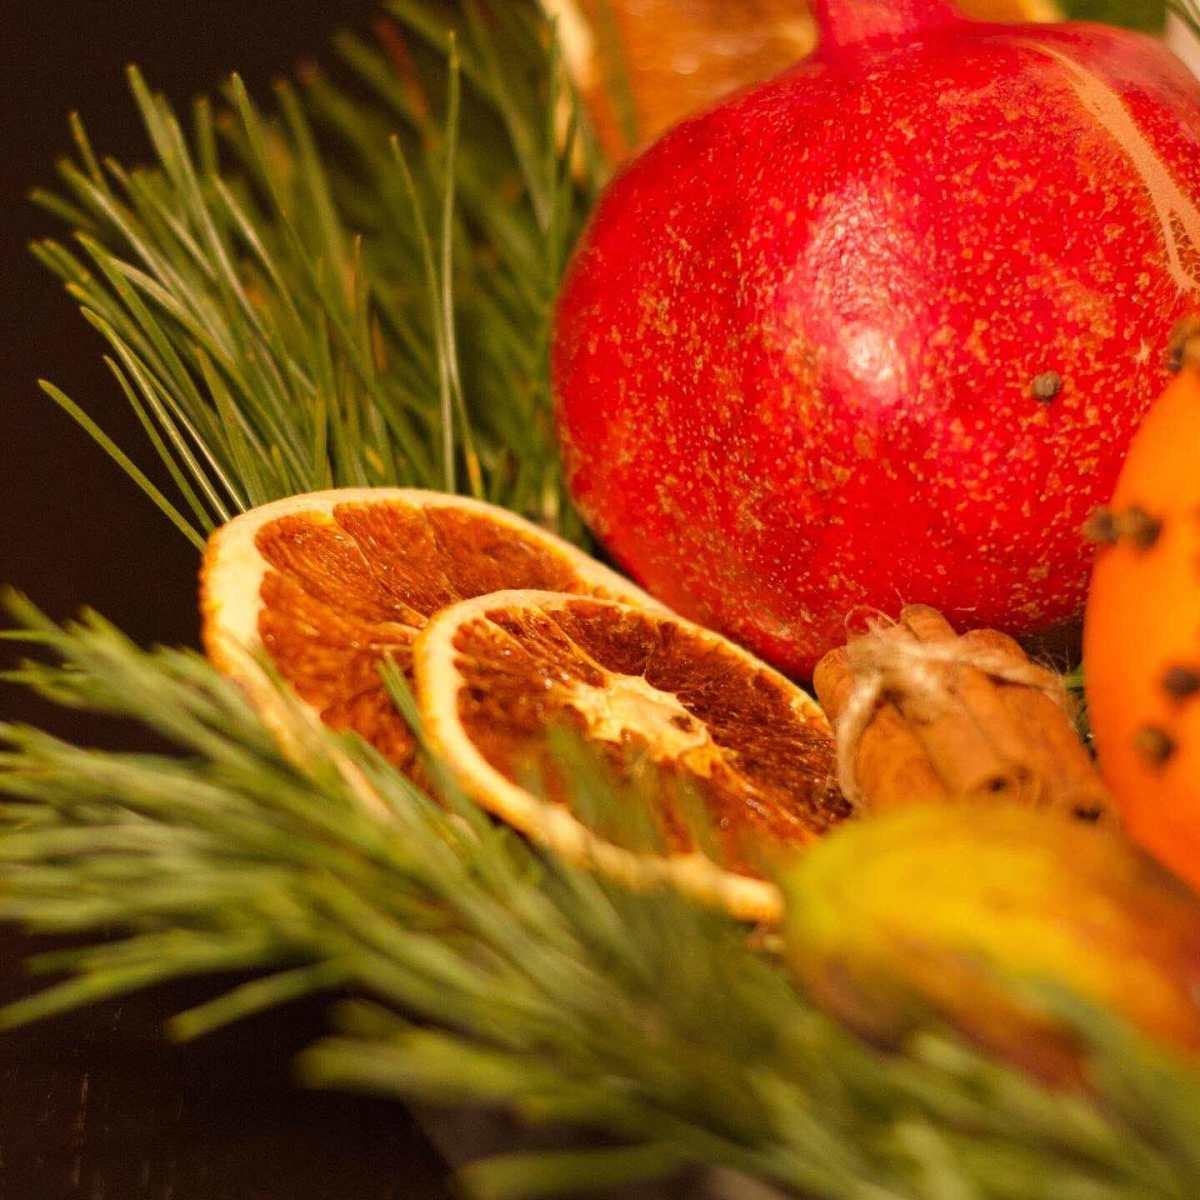 Natalia Lindberg Trädgårdsdesign - juldekorationer apelsiner torkade